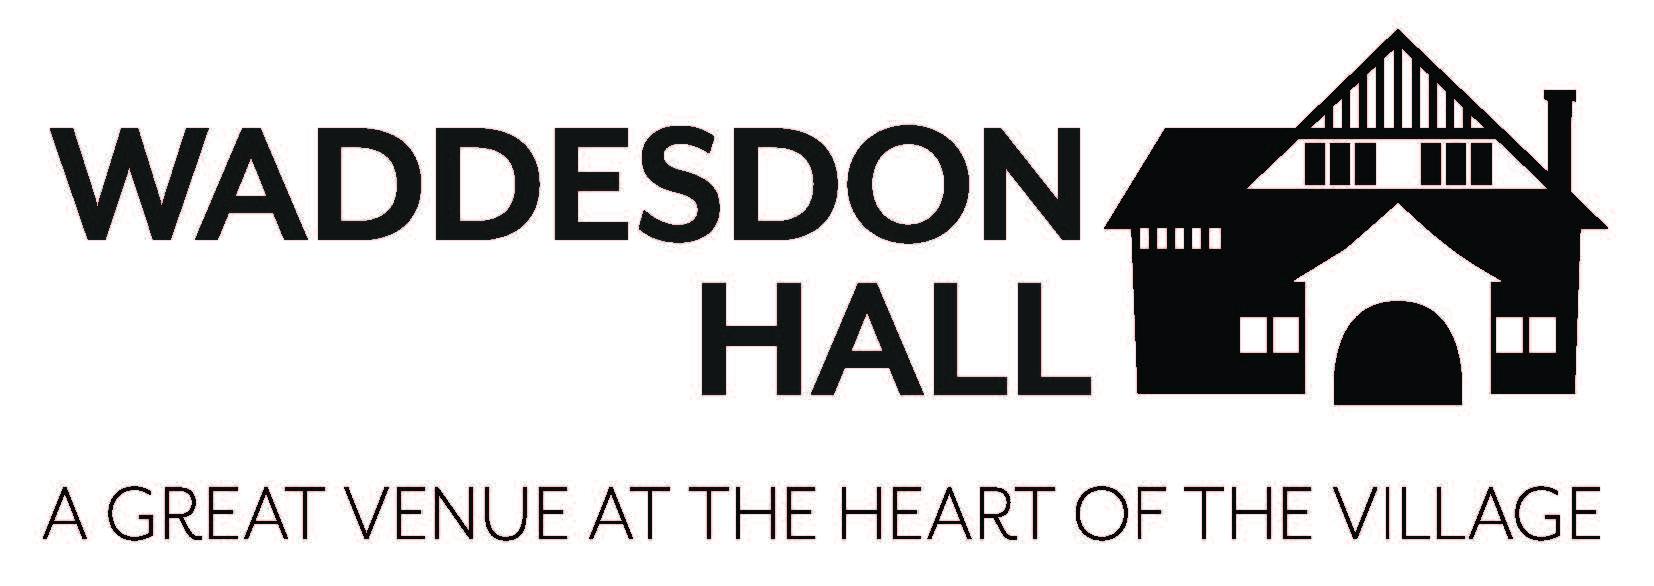 Waddesdon Hall